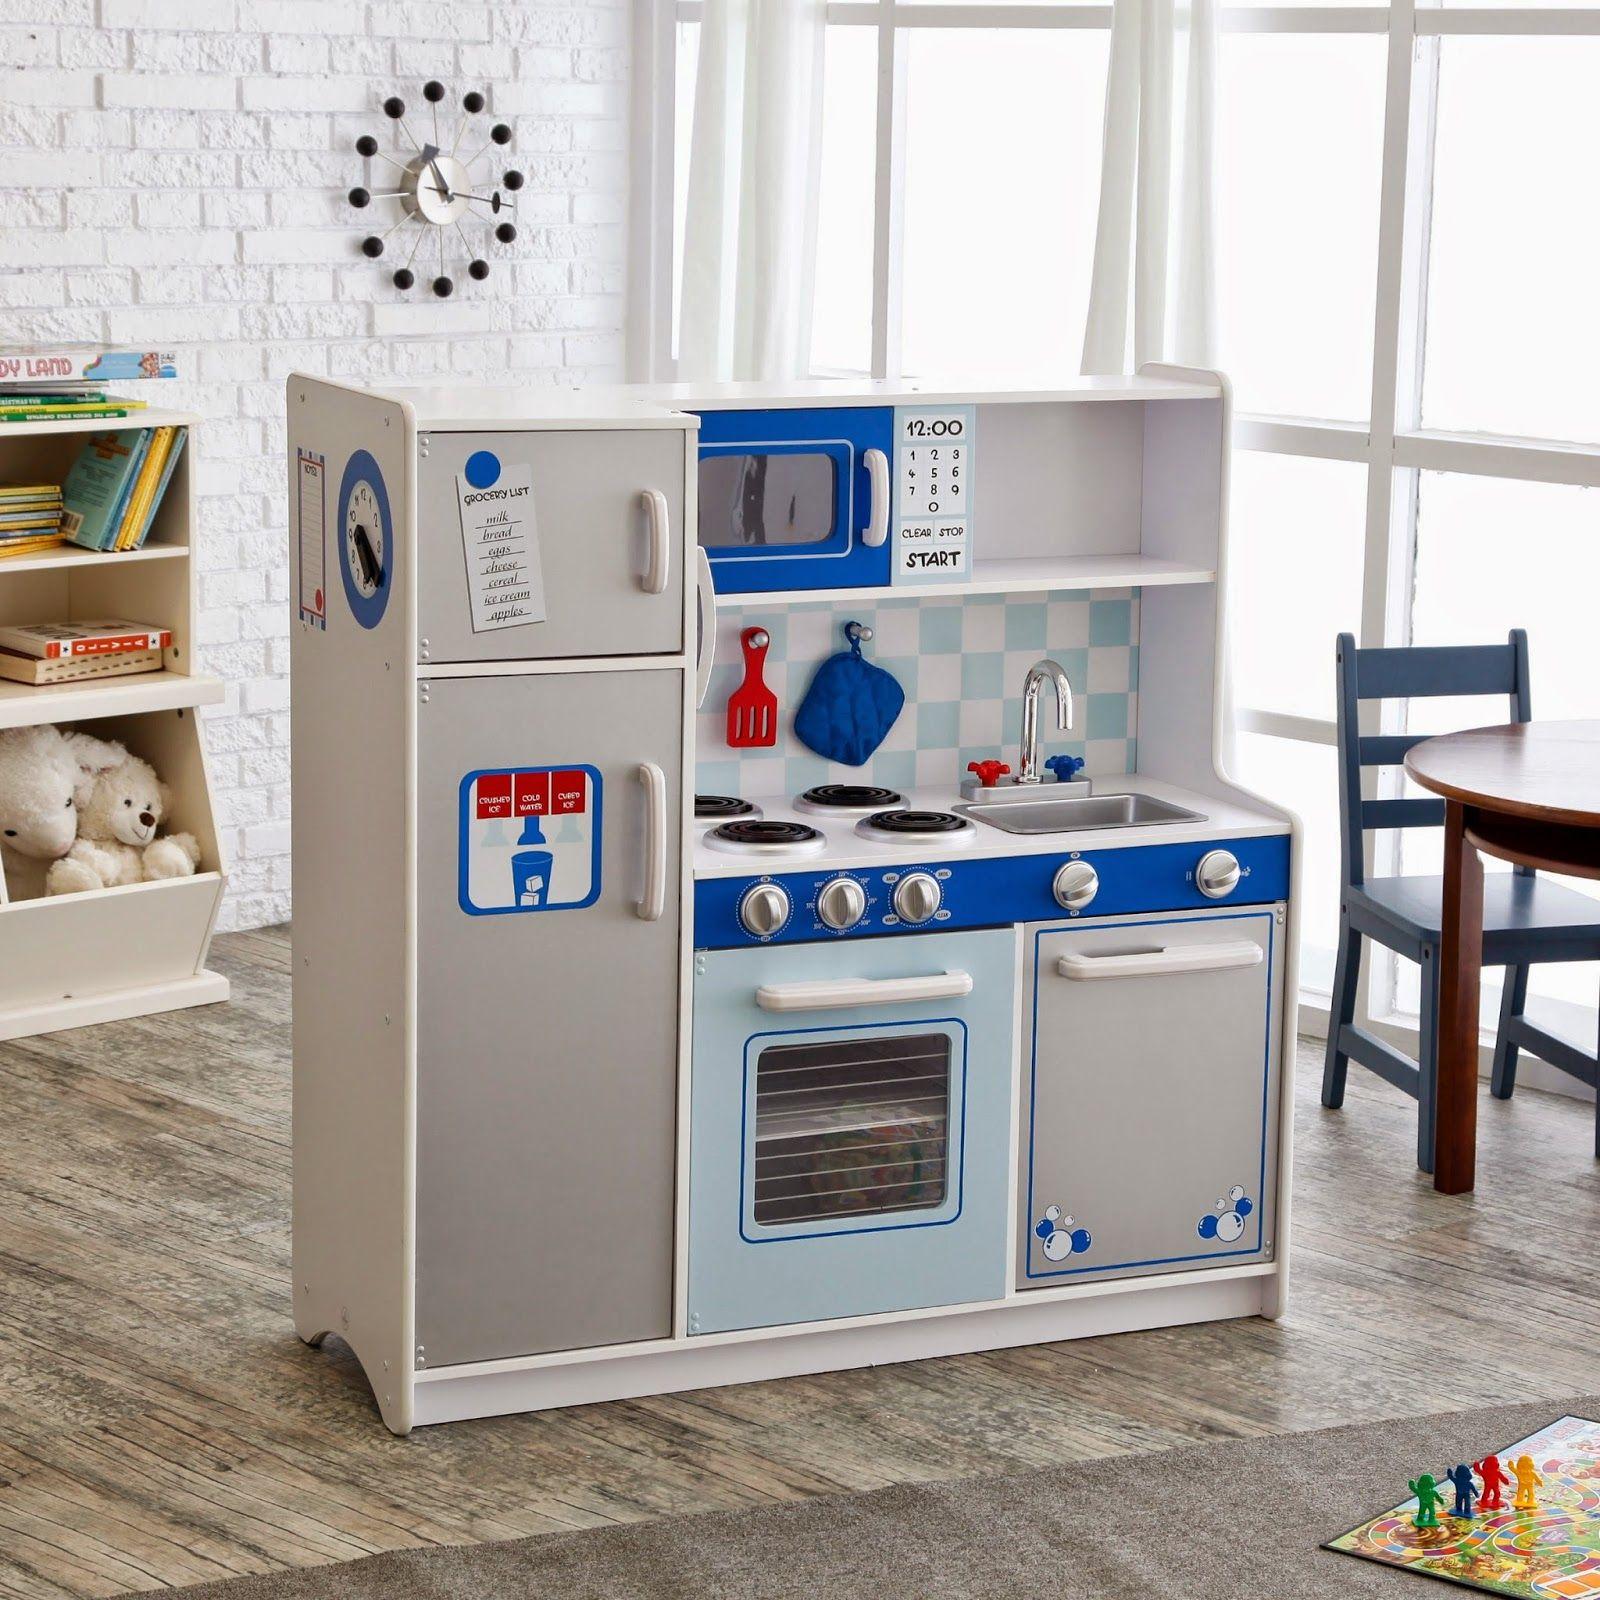 kidkraft toy kitchen exhaust fan for 我們看到了 我們是生活 家 美國木製玩具 傢俱製造商kidkraft 所 所推出的廚房系列